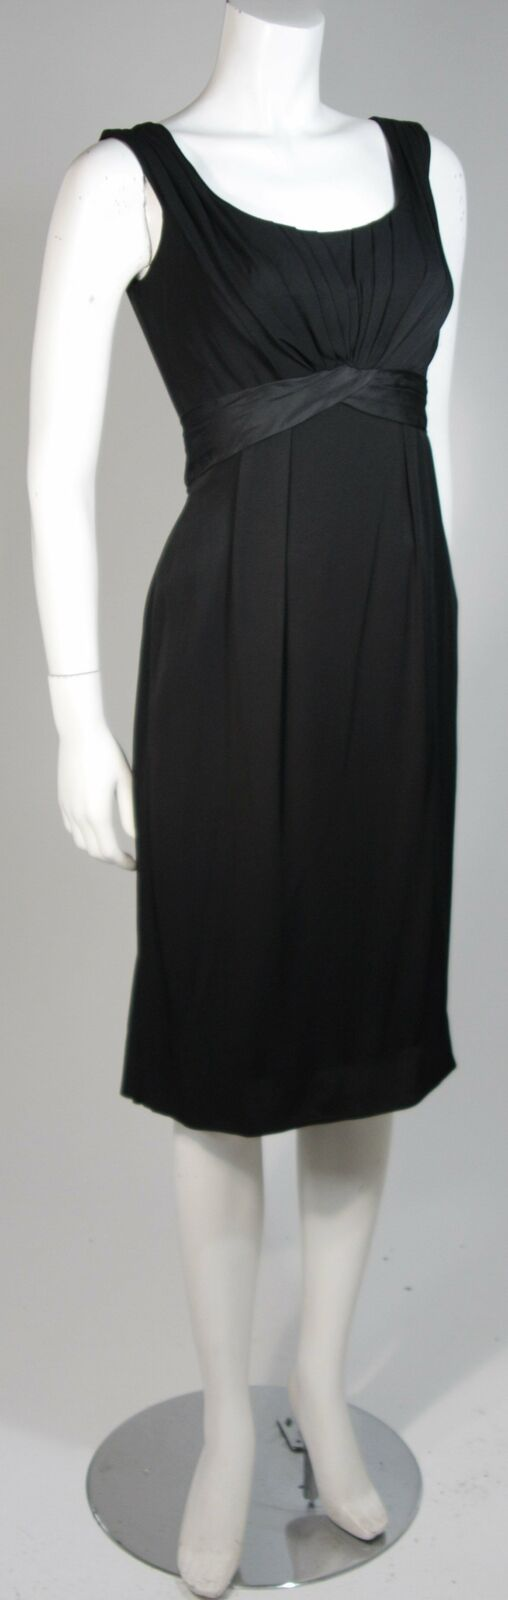 CEIL CHAPMAN 1950s Black Draped Cocktail Dress Si… - image 3